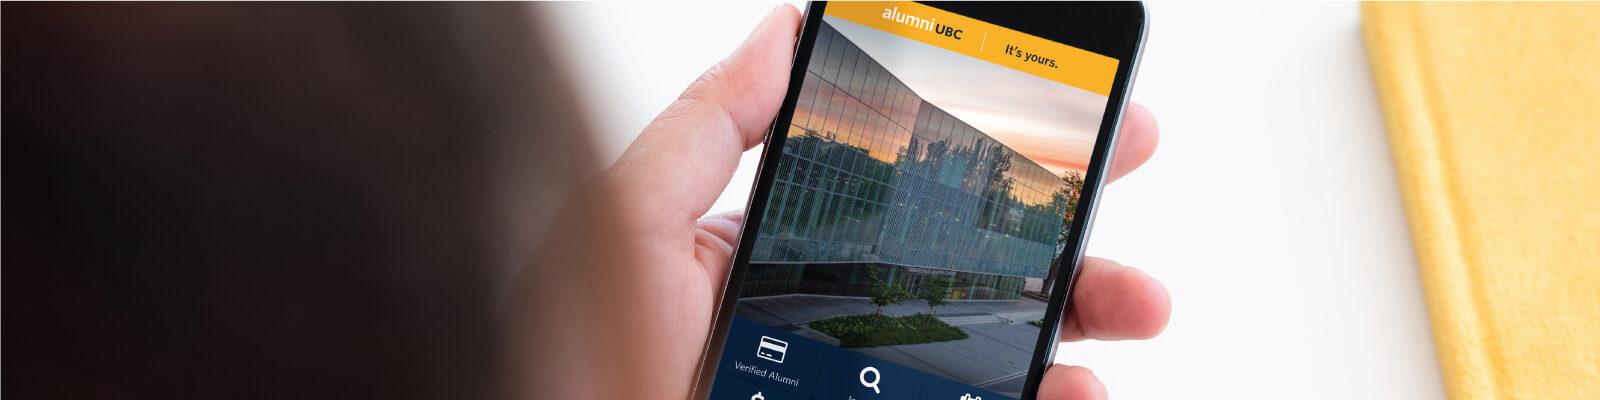 Alumni App image